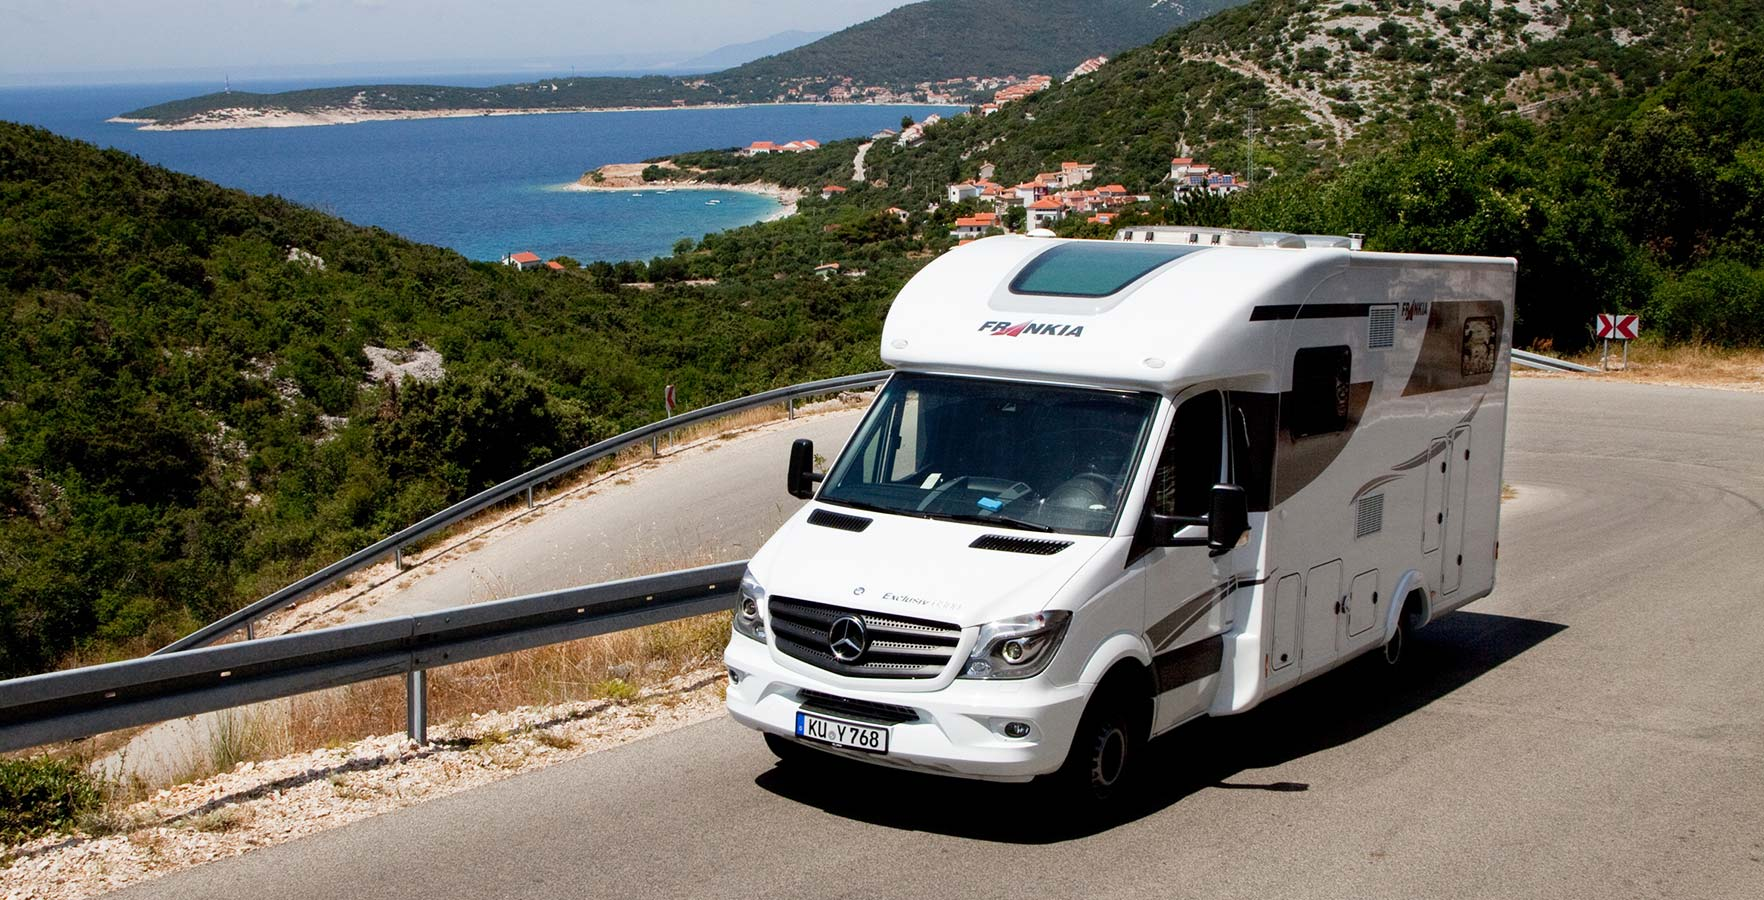 5ac91a41ab Croatia by camper or motor home - Croatian Camping Union - Croatian ...